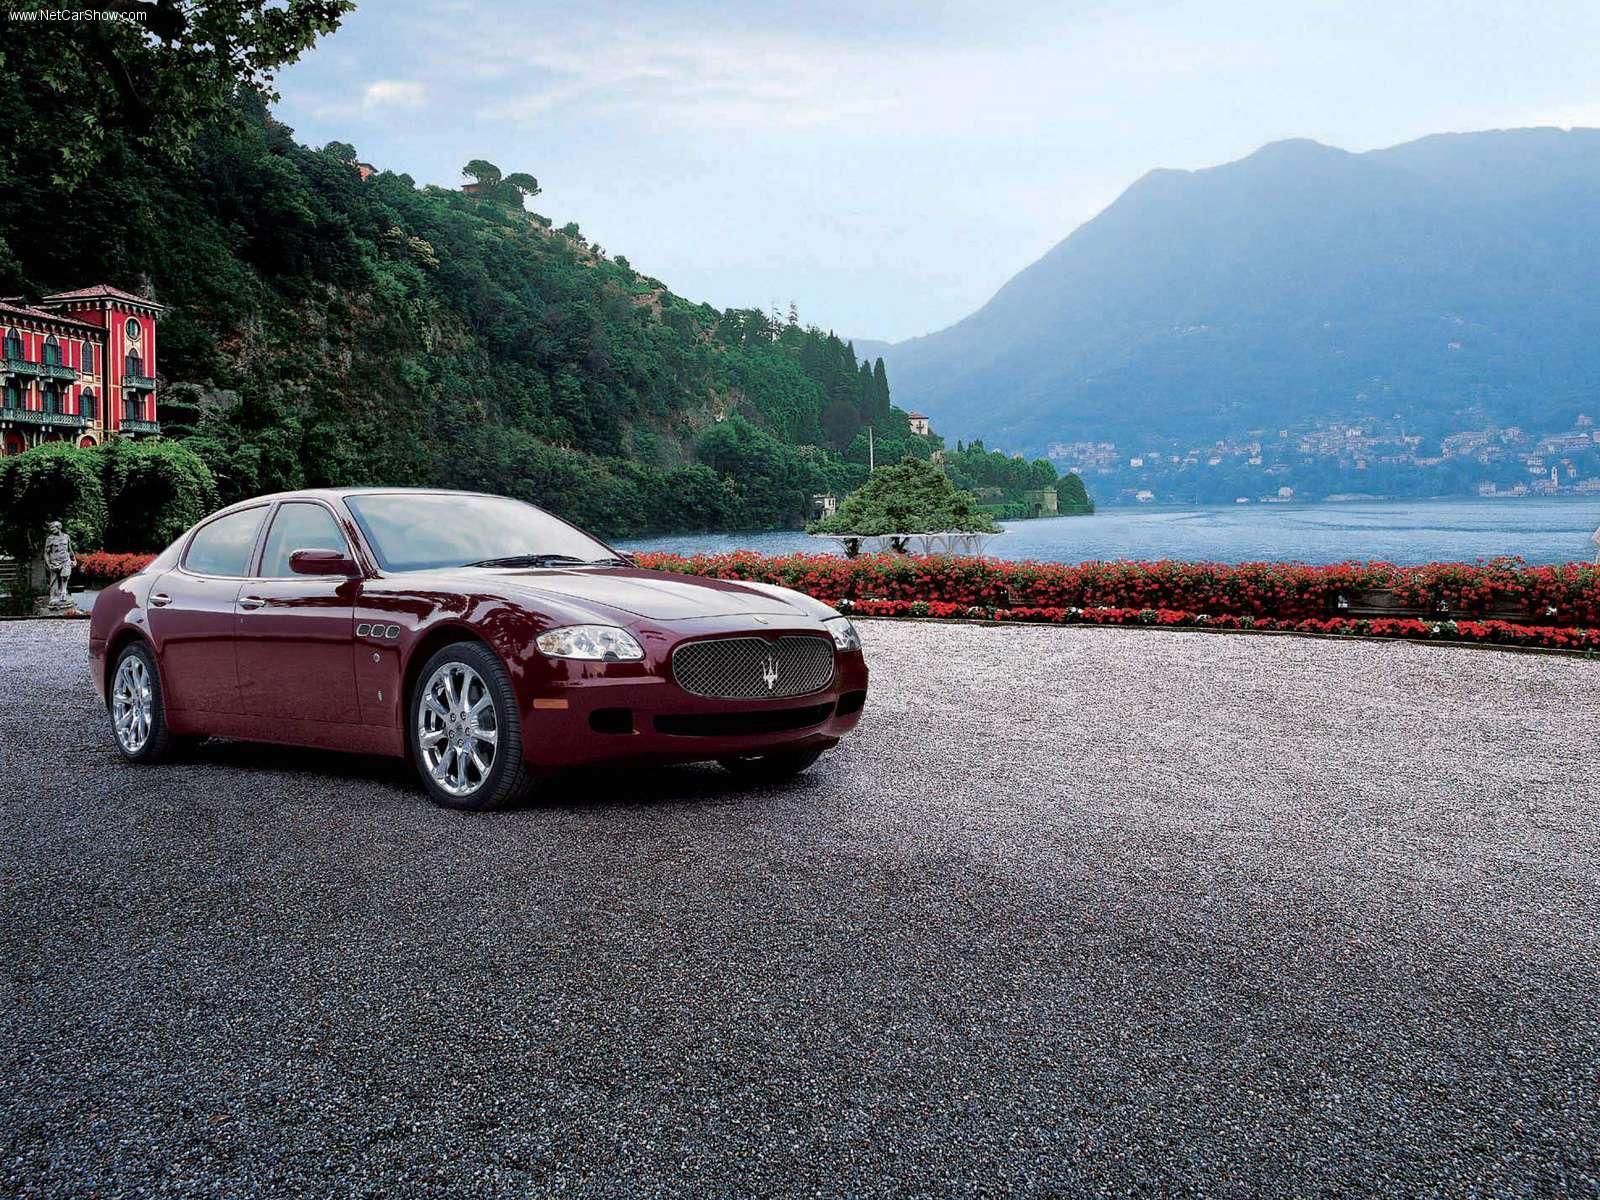 Hình ảnh siêu xe Maserati Quattroporte Neiman Marcus 2004 & nội ngoại thất